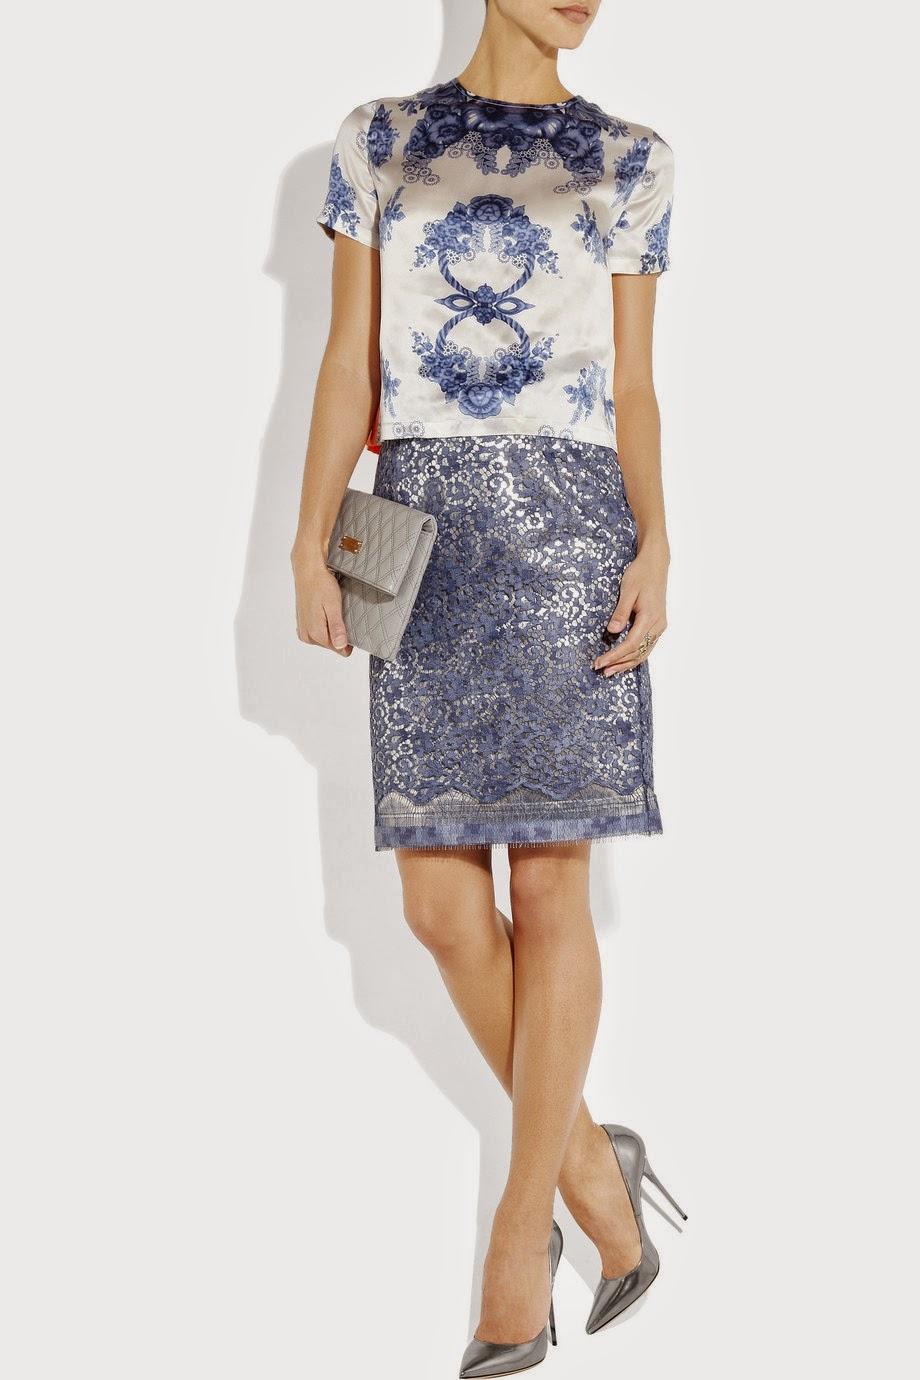 dde74fcf232 Jimmy Choo Anouk Mirror Silver Leather - Reed Fashion Blog